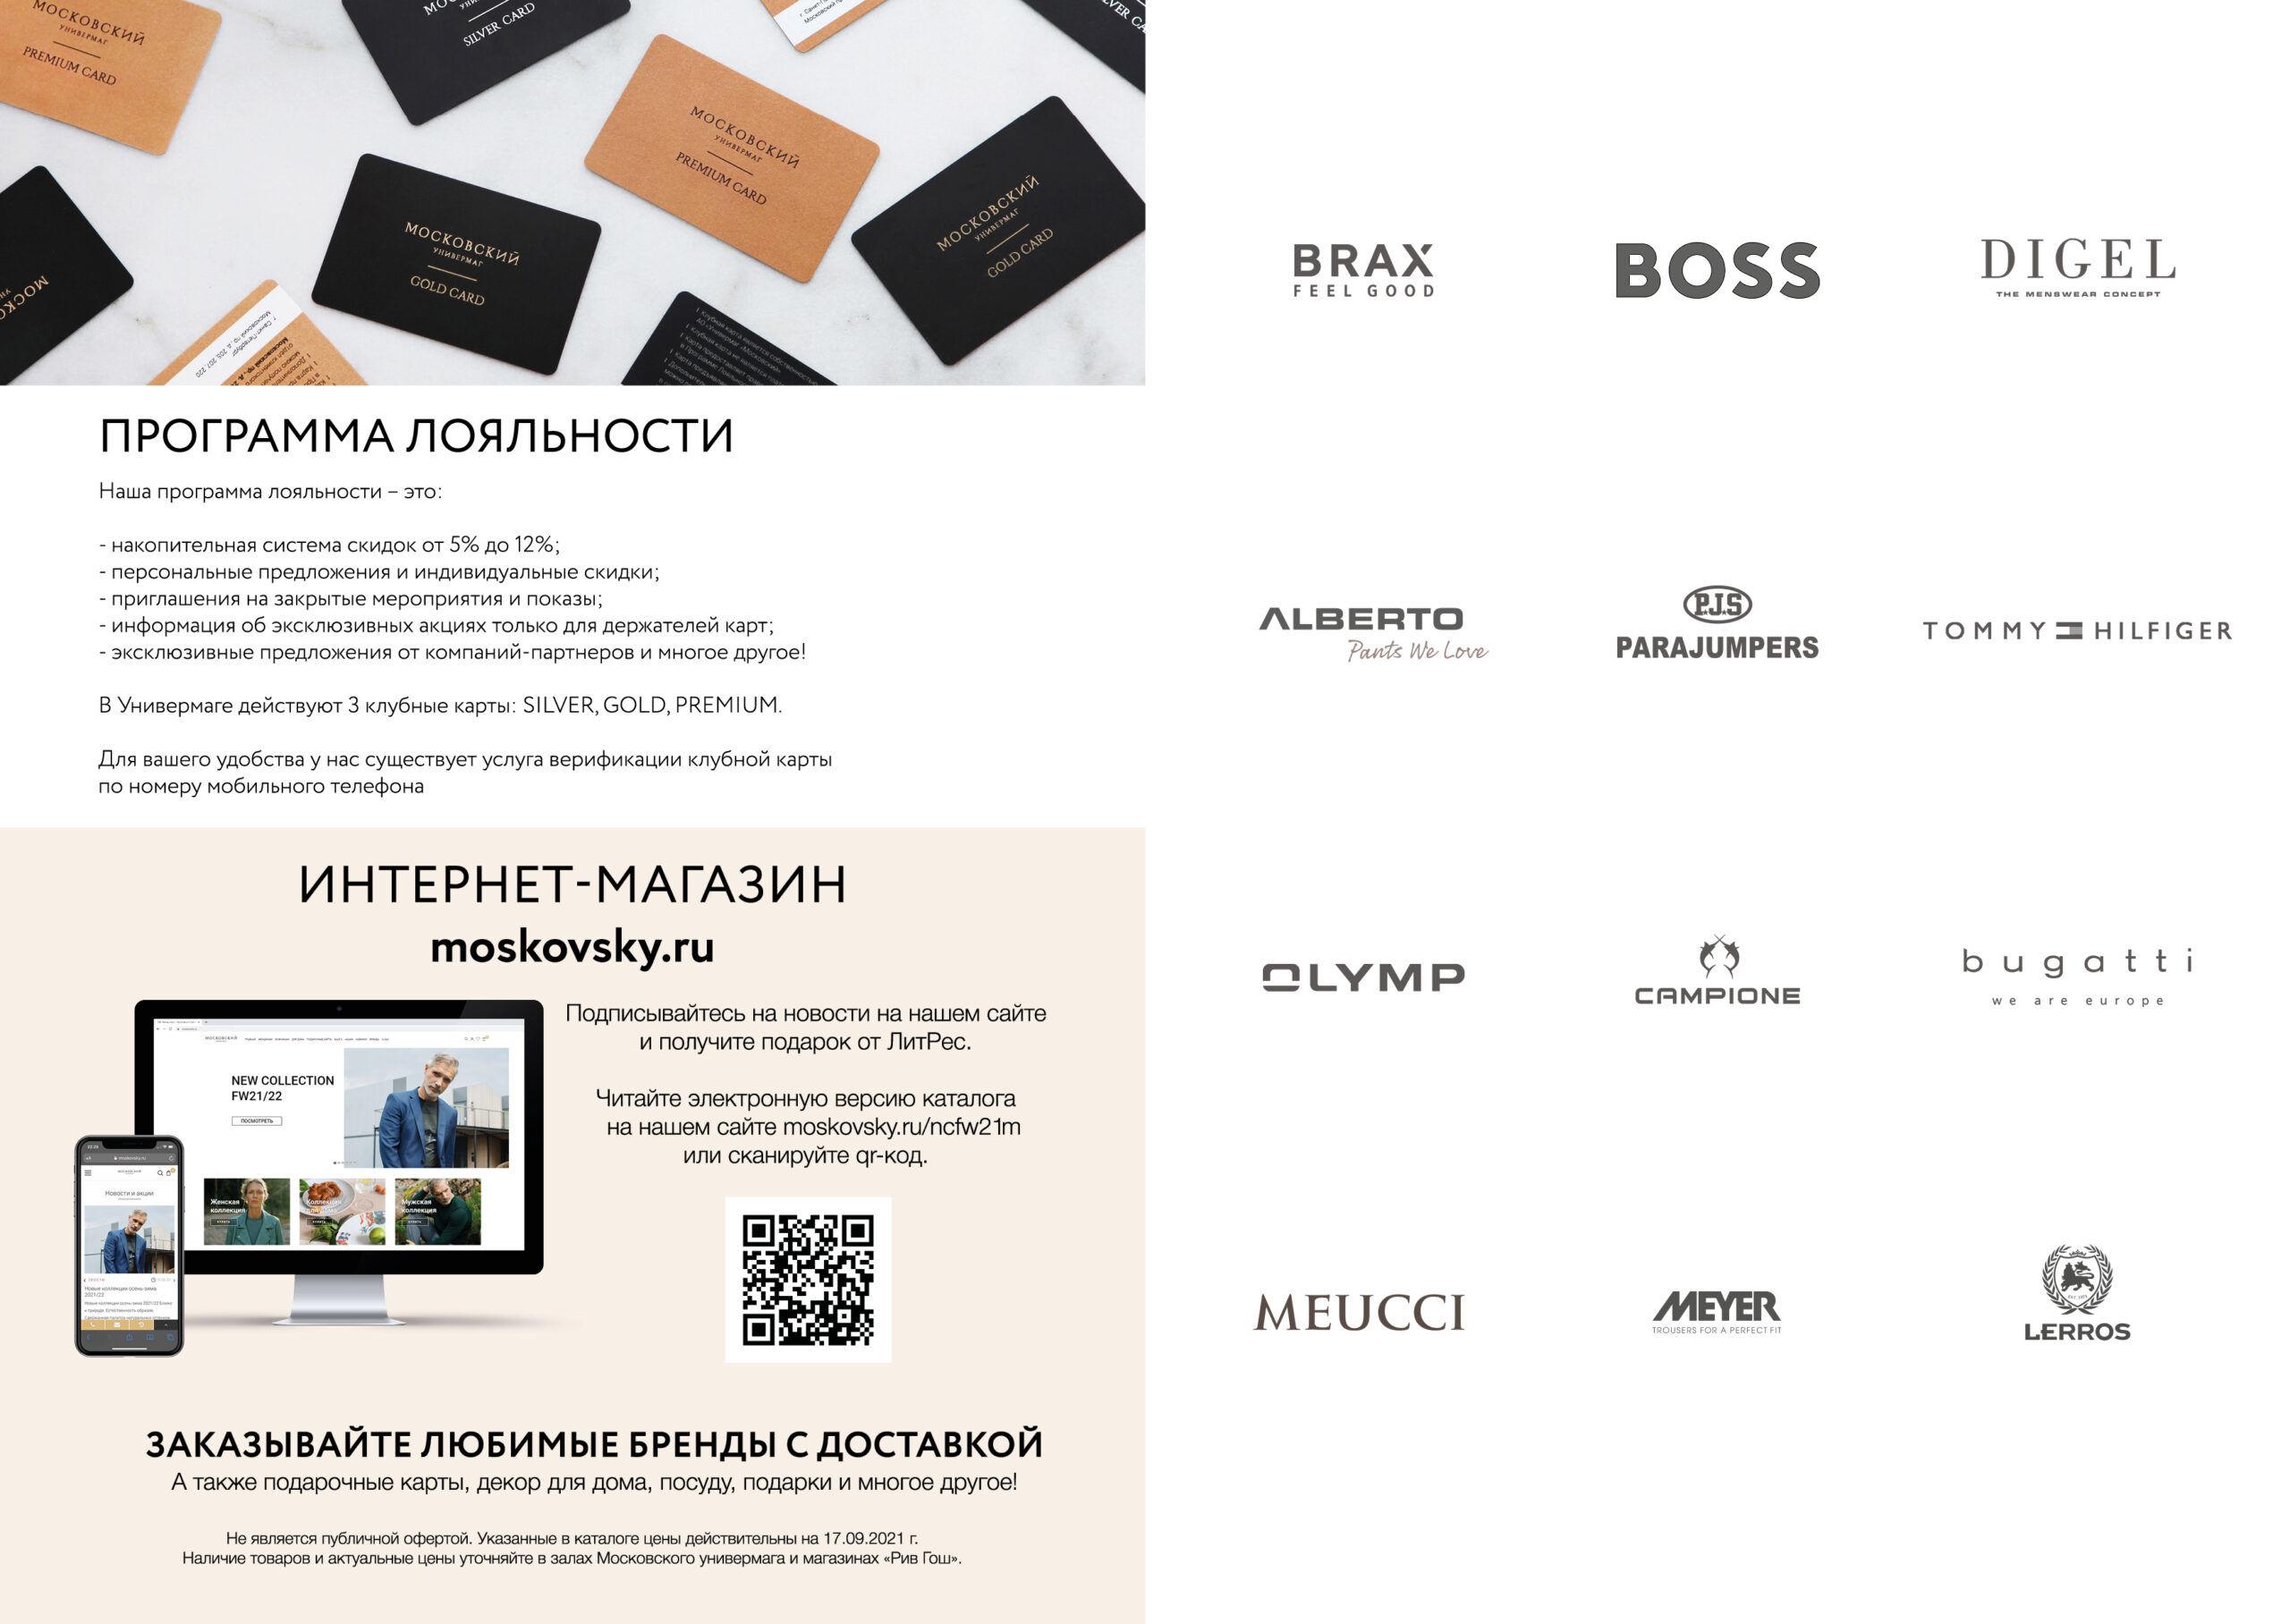 Московский каталог fw21-22_a5_МУЖ10